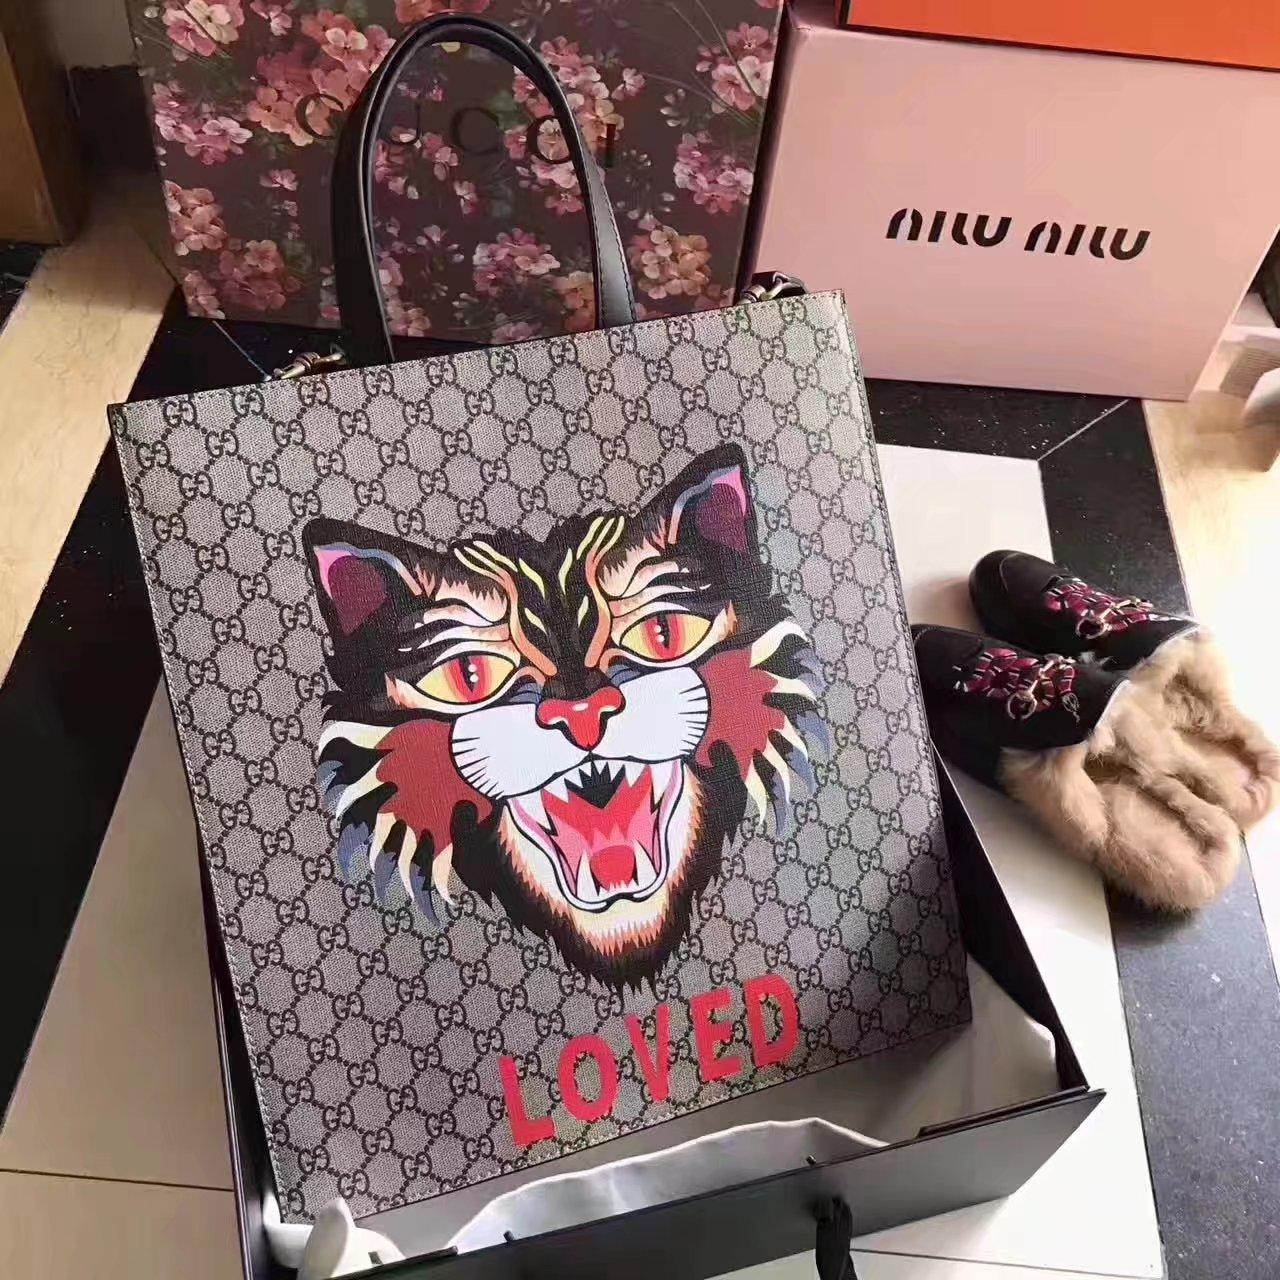 Gucci 450950 Angry Cat Print GG Supreme Tote Bag